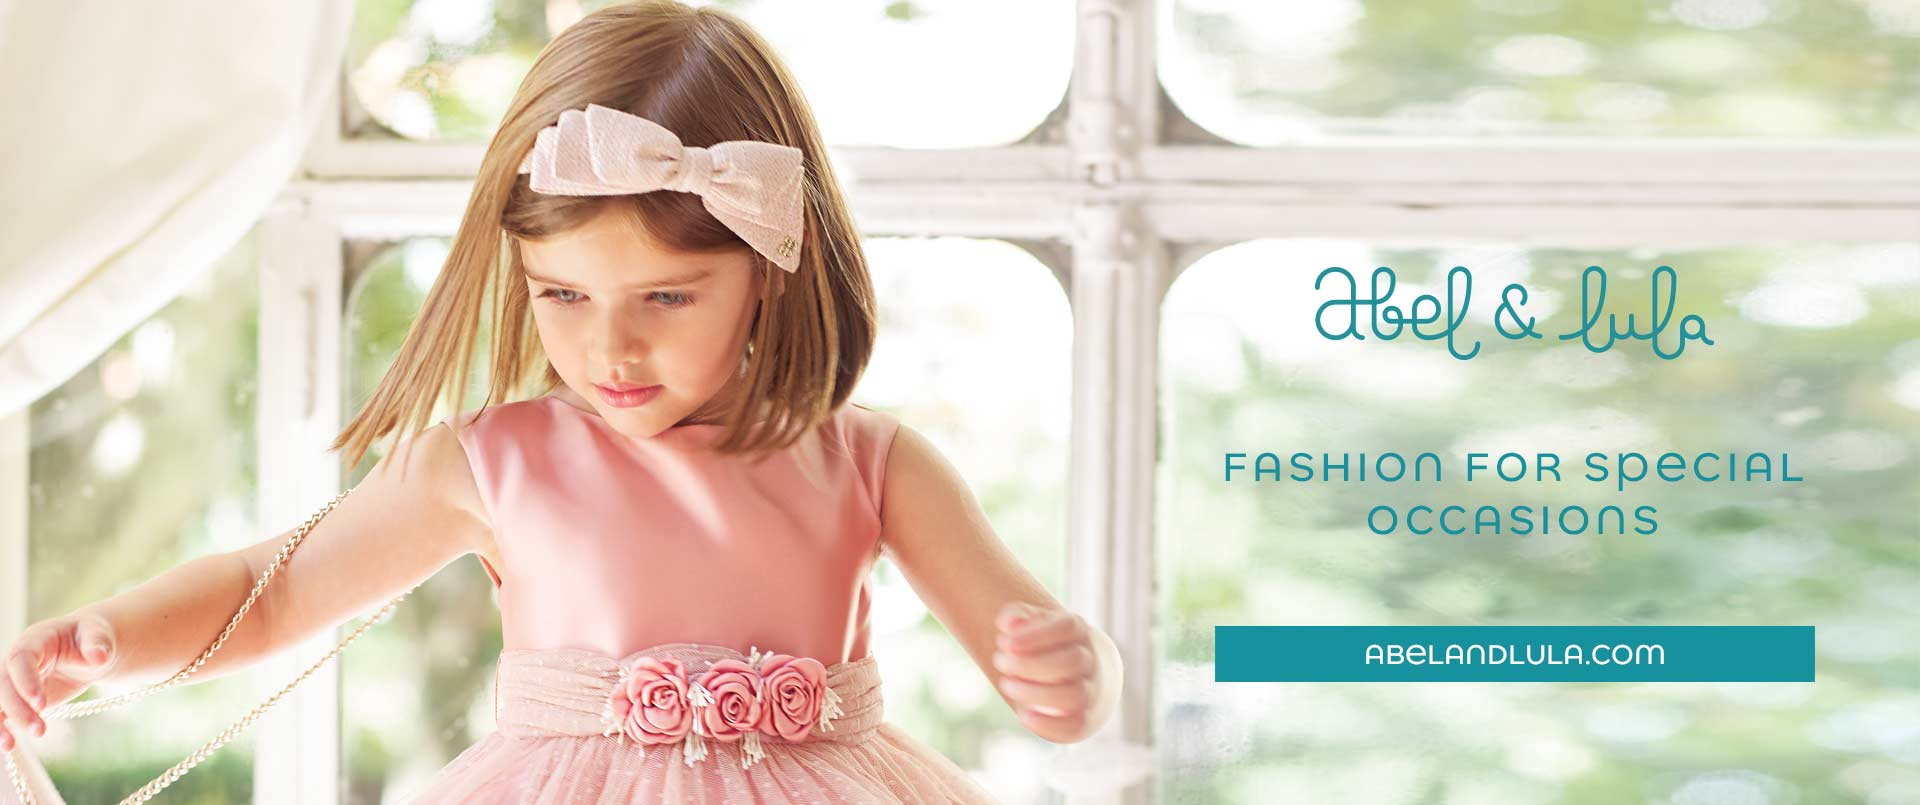 0cb7f8f060c9 Childrens fashion